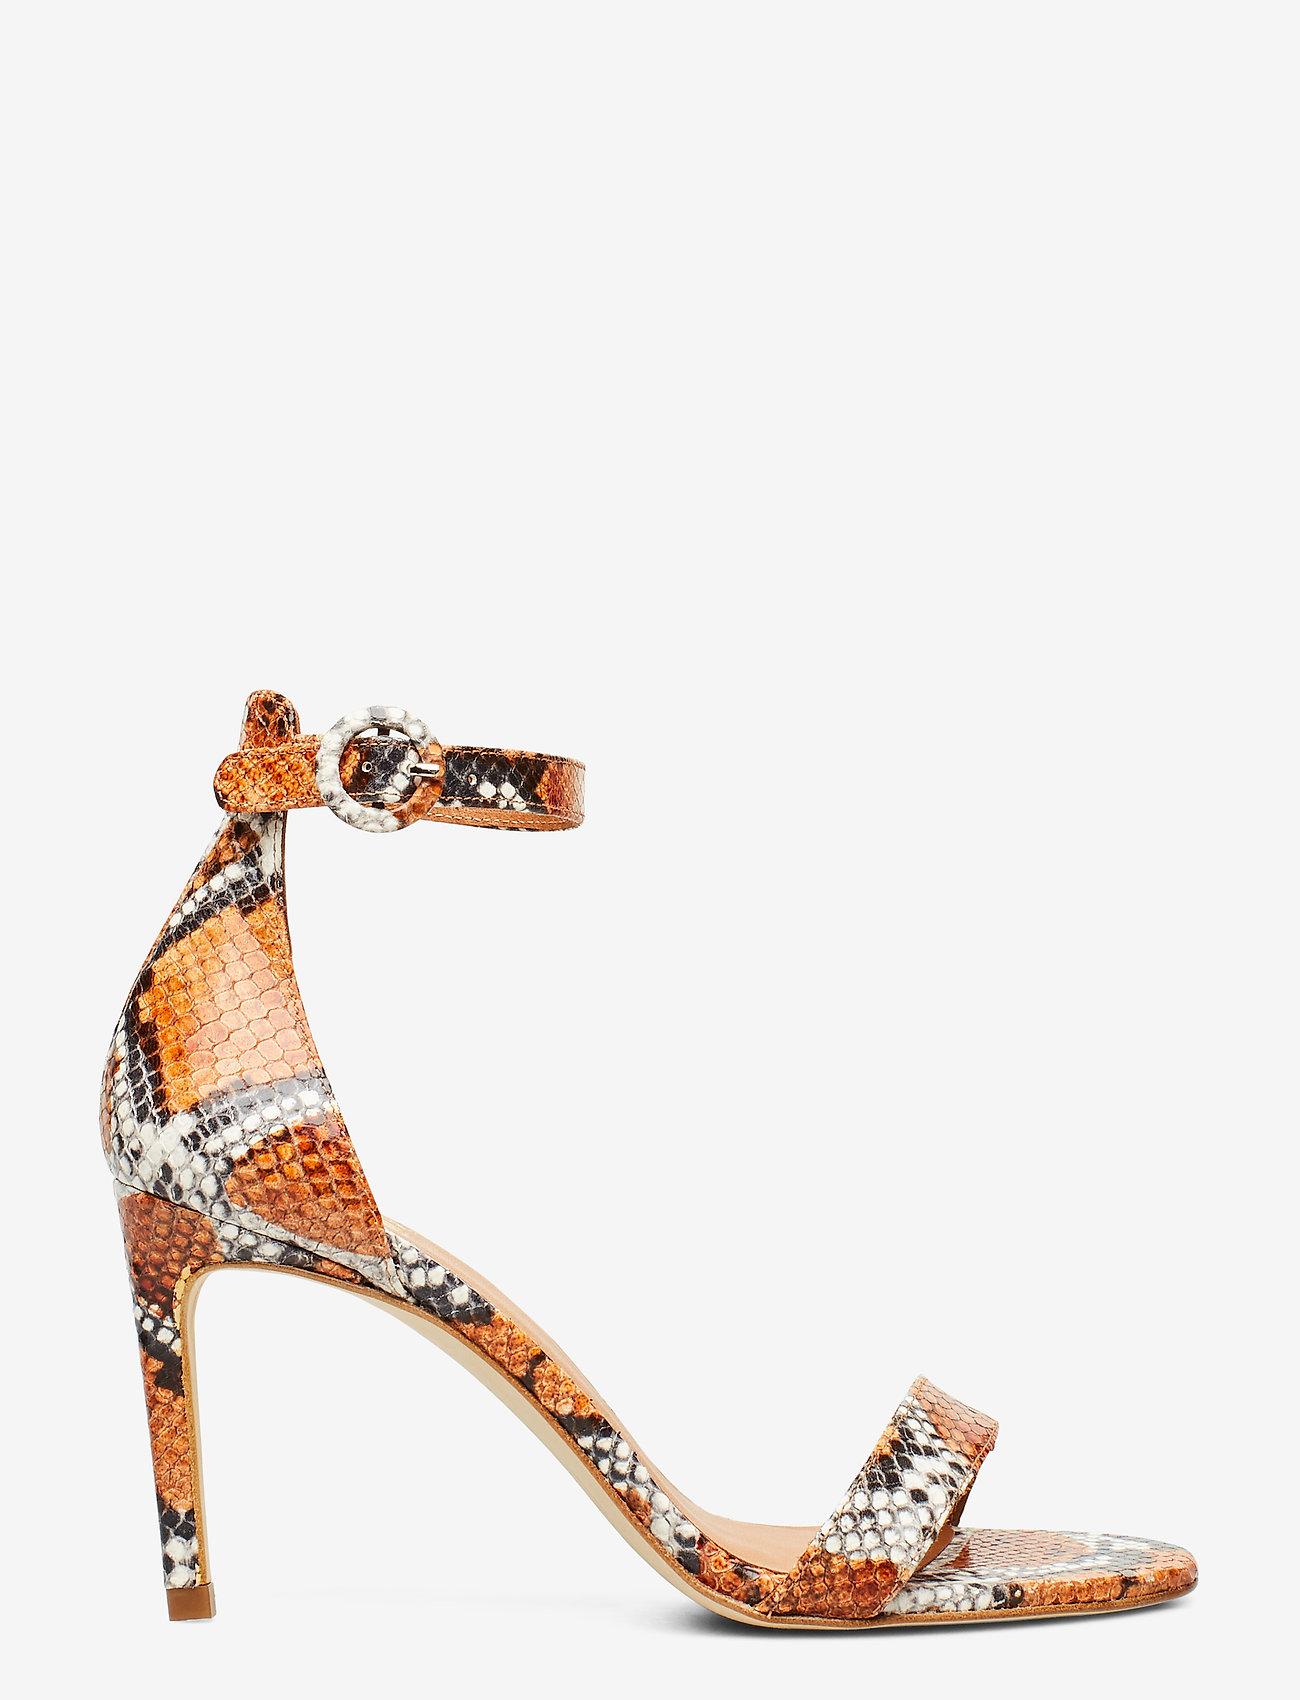 Billi Bi - Sandals 4693 - høyhælte sandaler - orange 944 snake 37 - 1